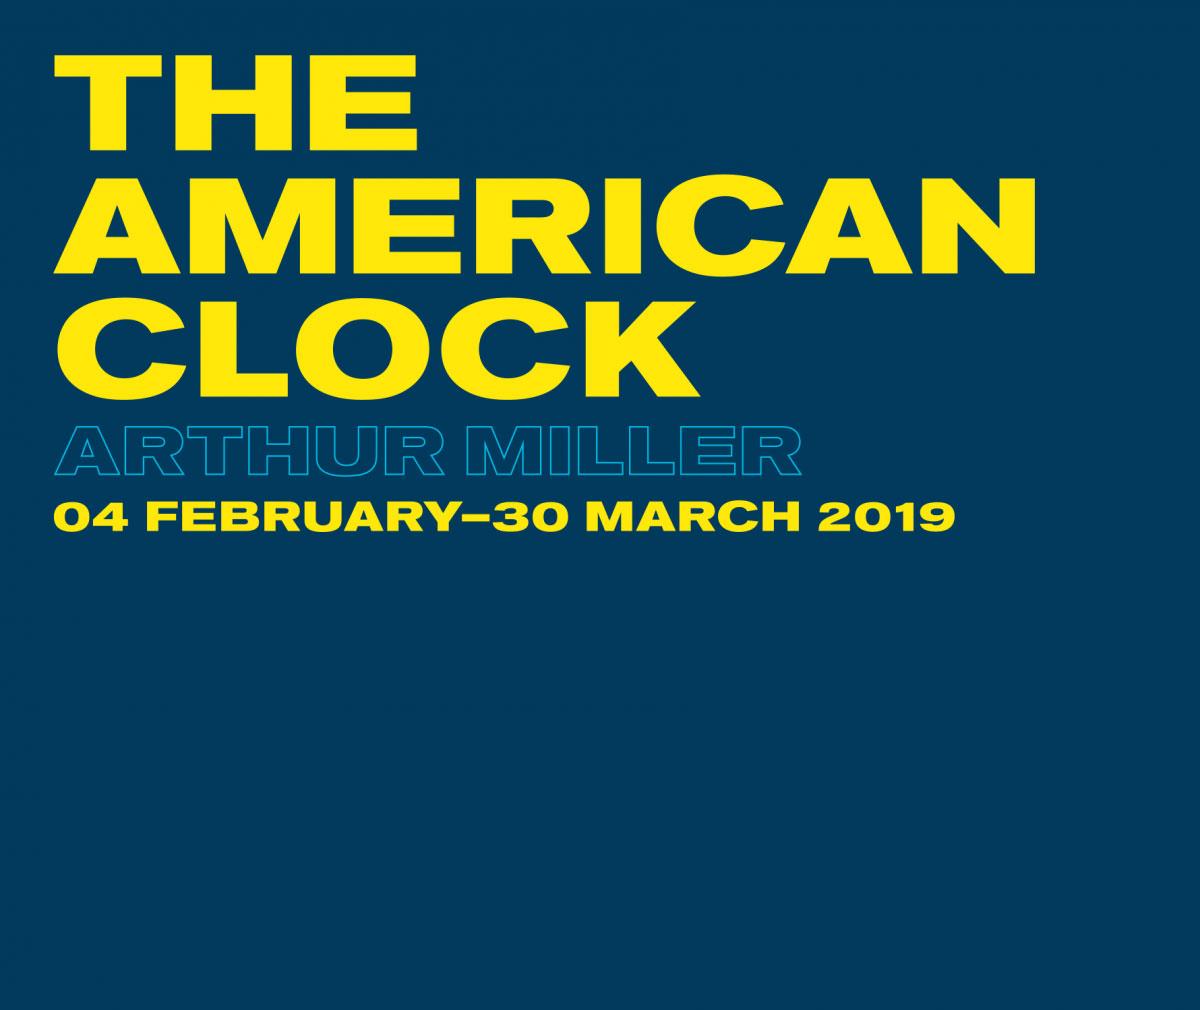 american-clock-image-web.jpg